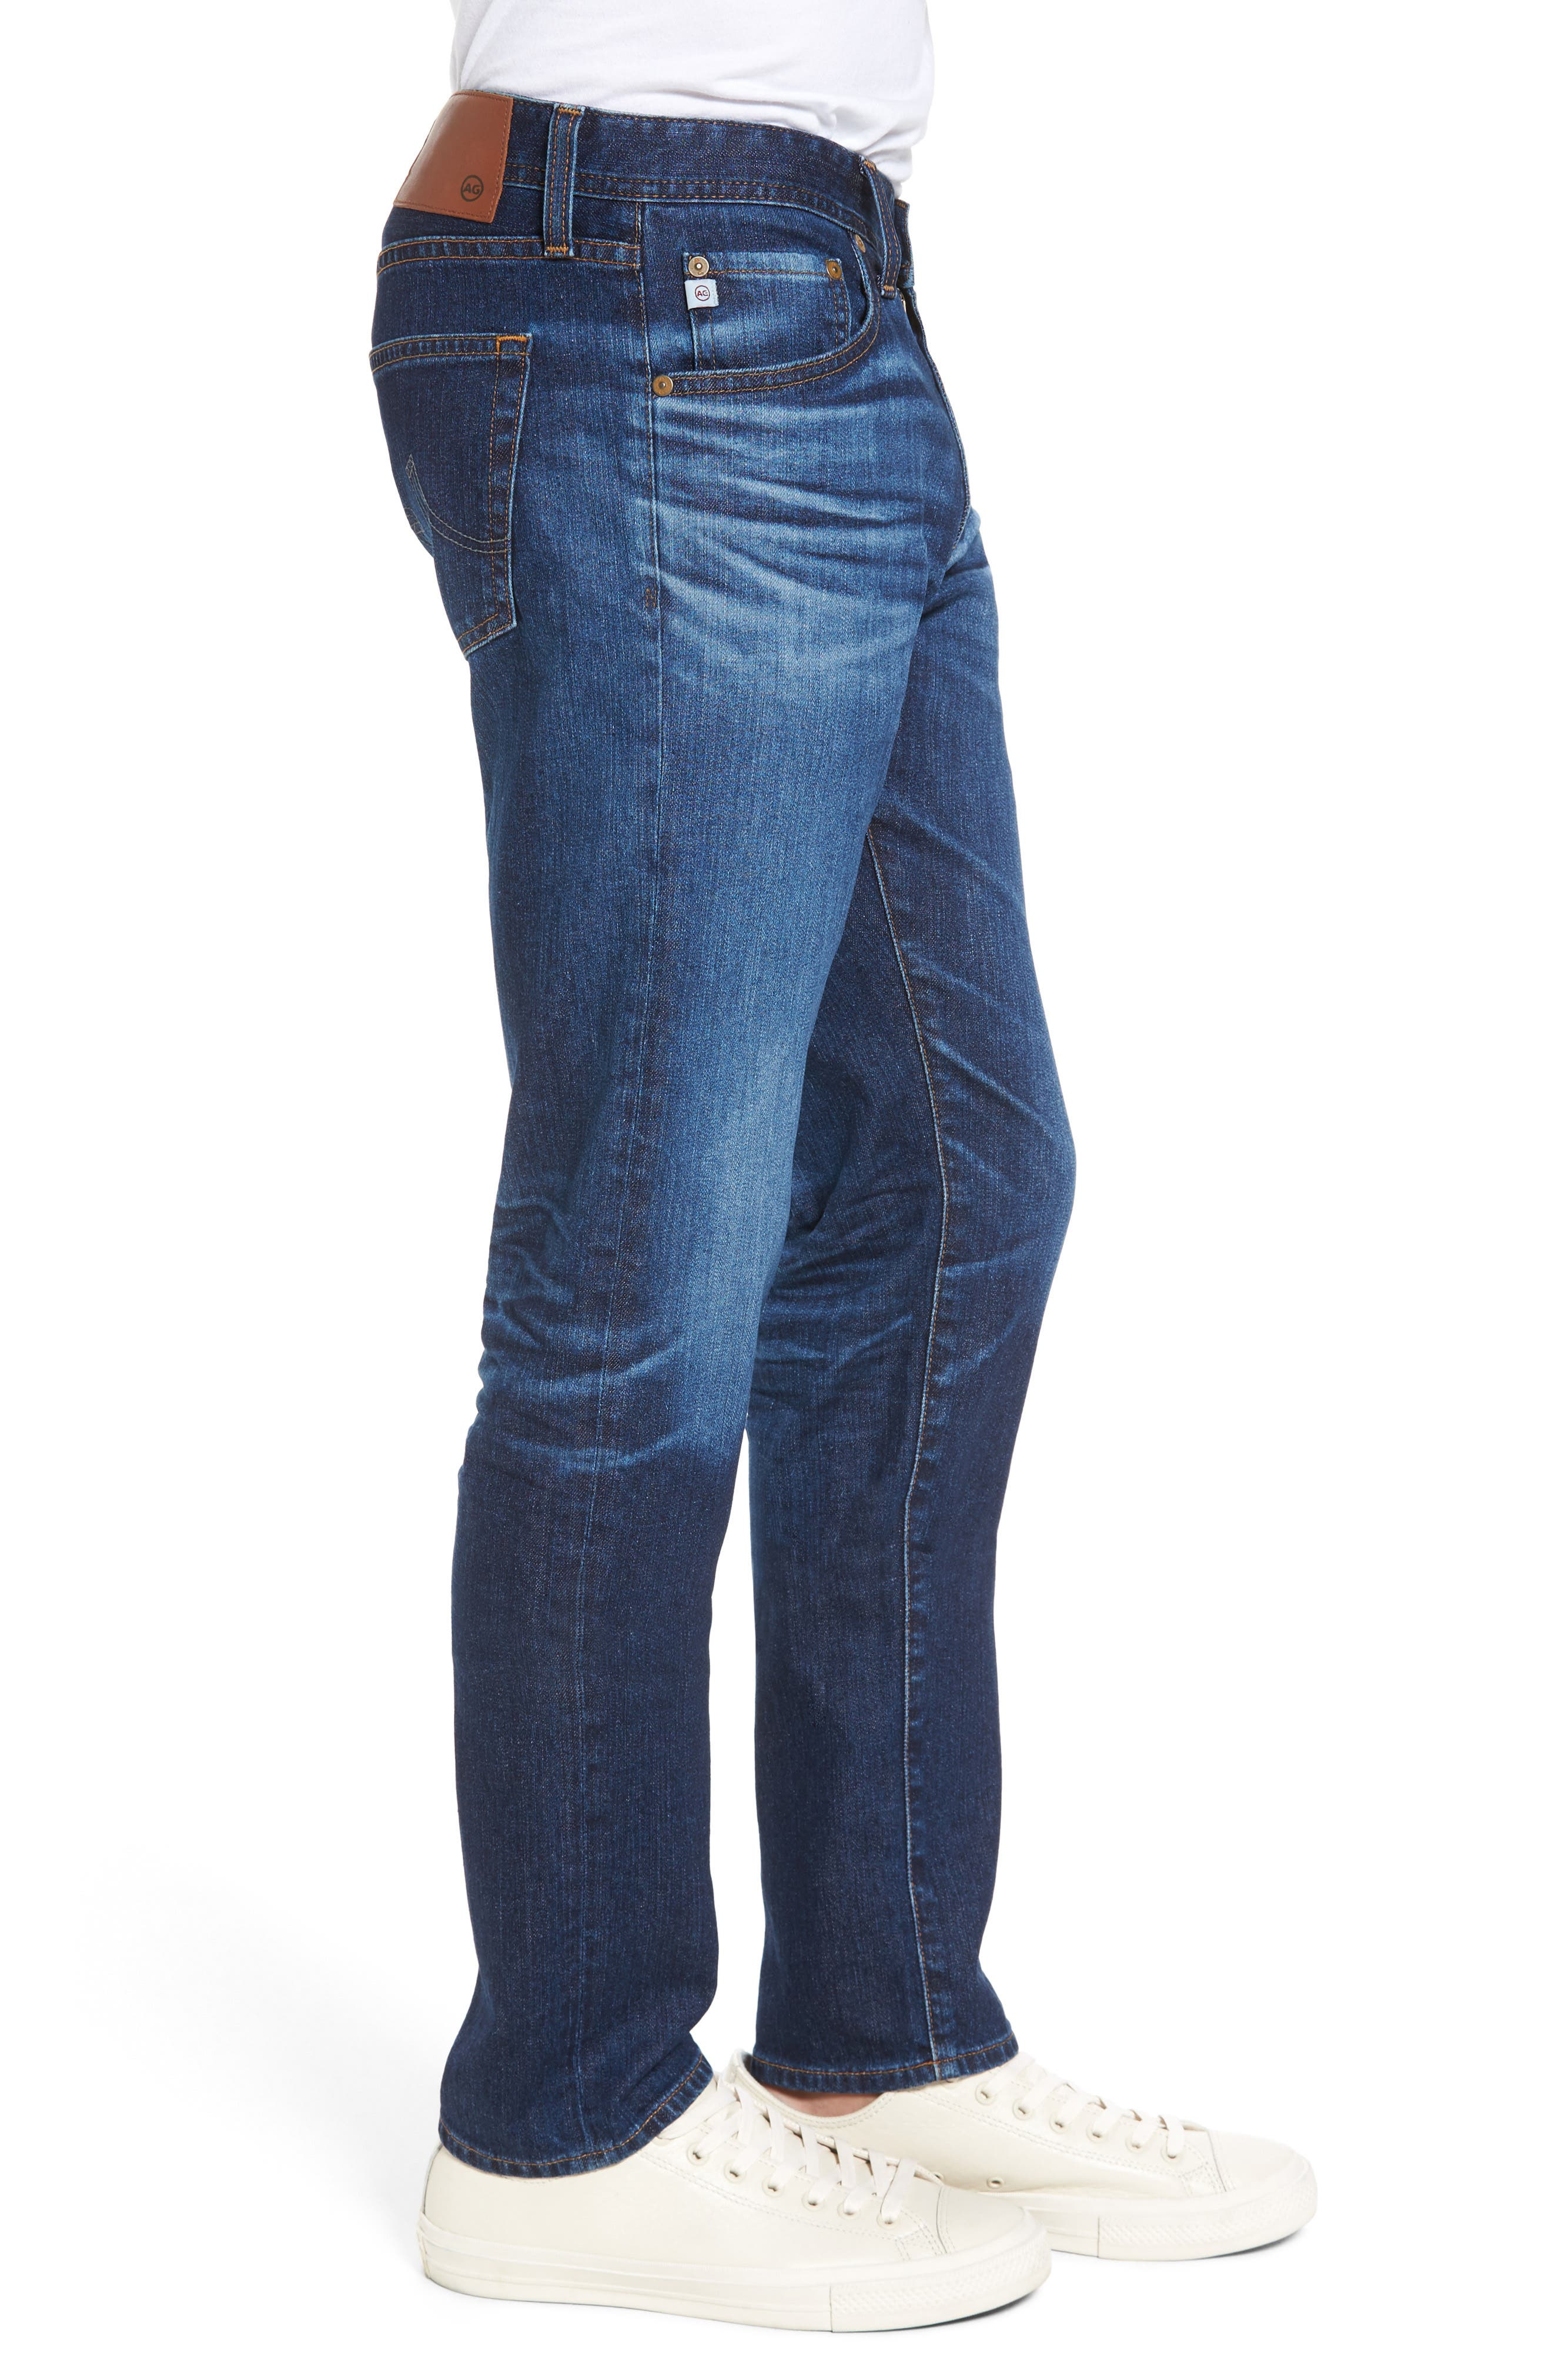 Tellis Slim Fit Jeans,                             Alternate thumbnail 3, color,                             451